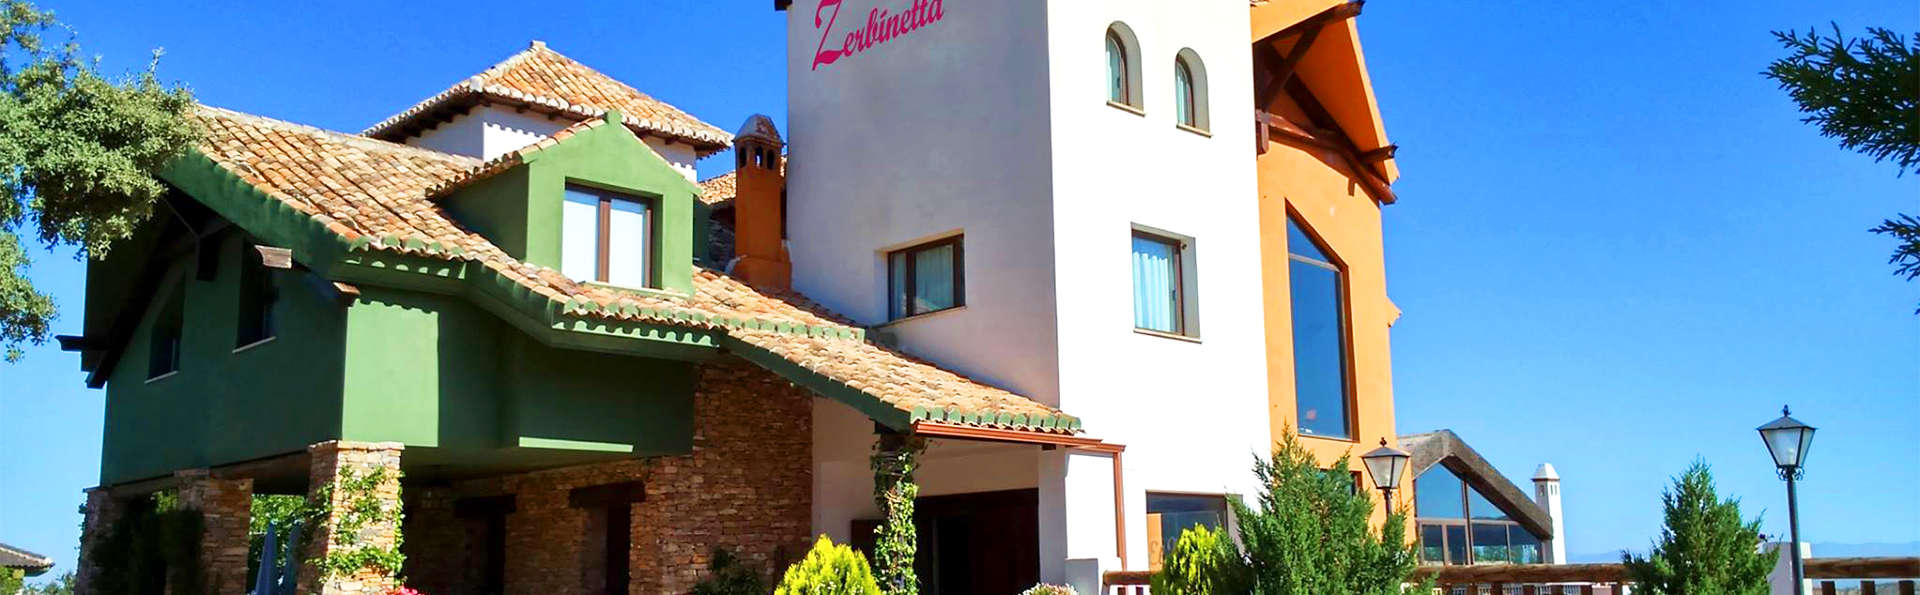 Hotel Zerbinetta - EDIT_2_FACHADA.jpg